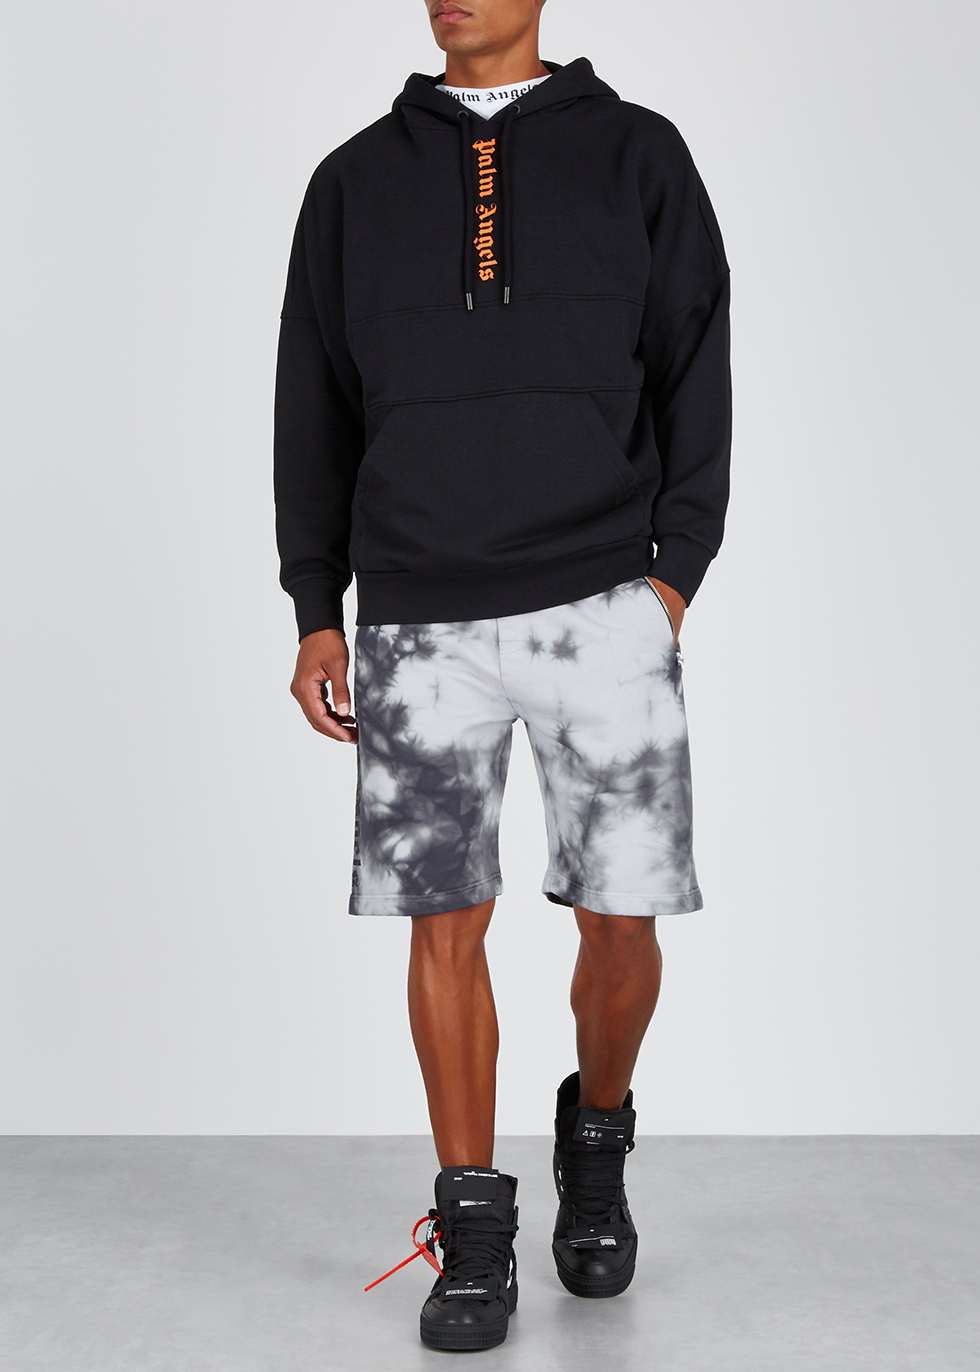 Grey tie-dye cotton shorts - Palm Angels